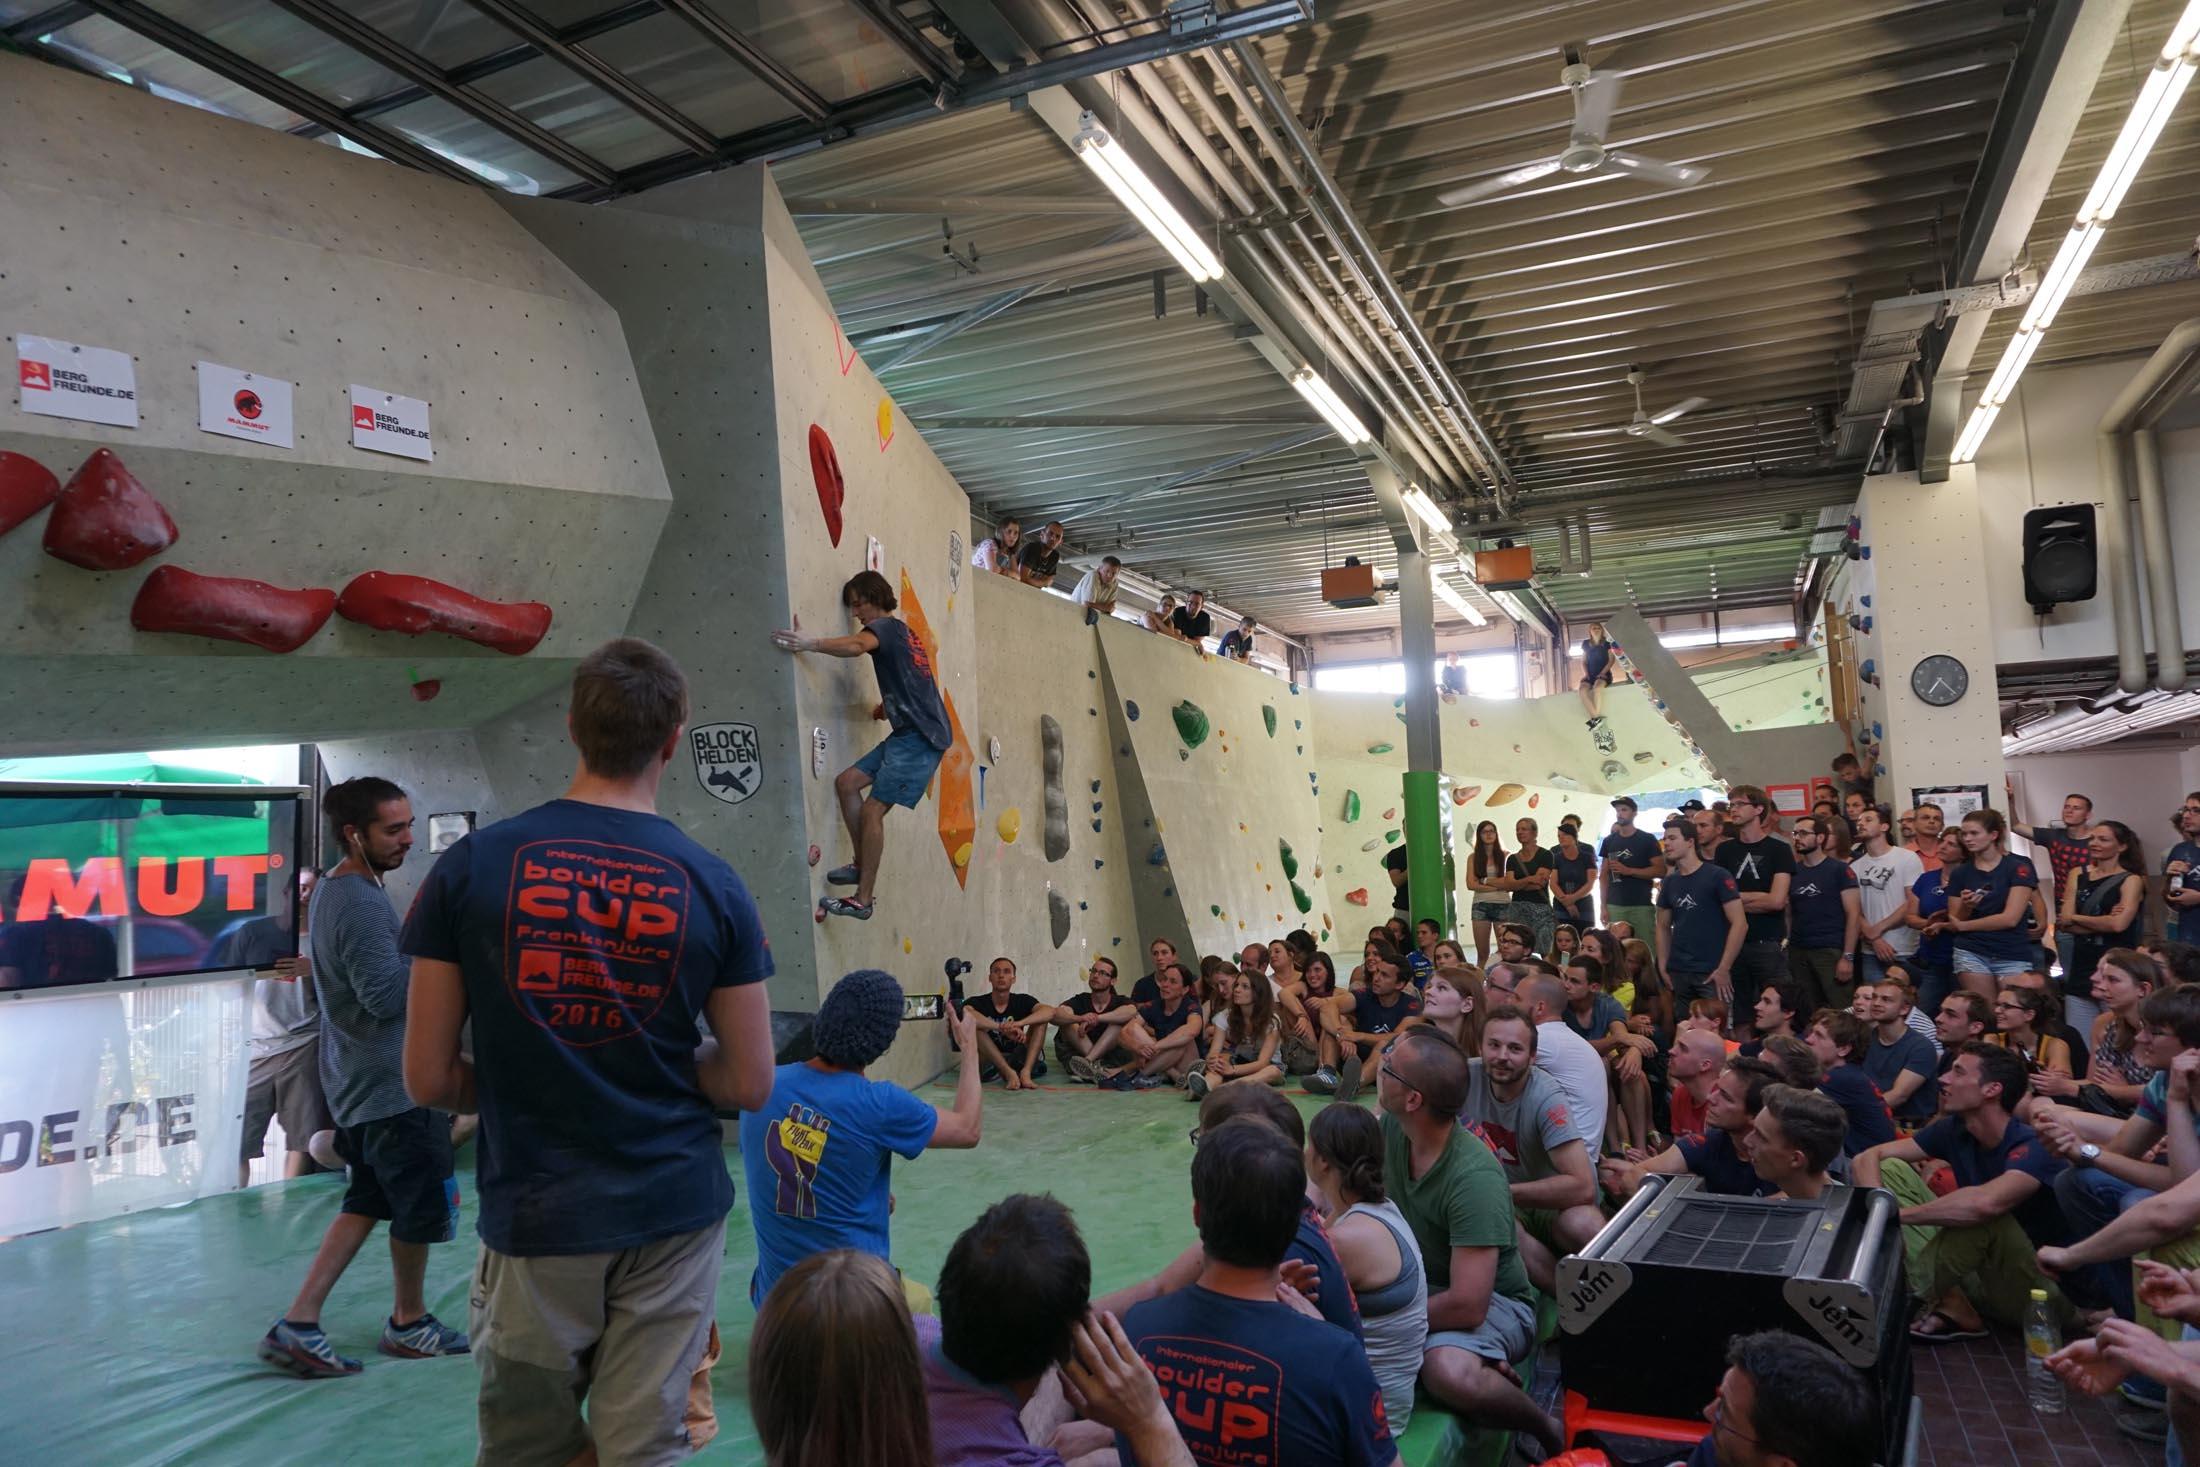 Finale, internationaler bouldercup Frankenjura 2016, BLOCKHELDEN Erlangen, Mammut, Bergfreunde.de, Boulderwettkampf07092016620